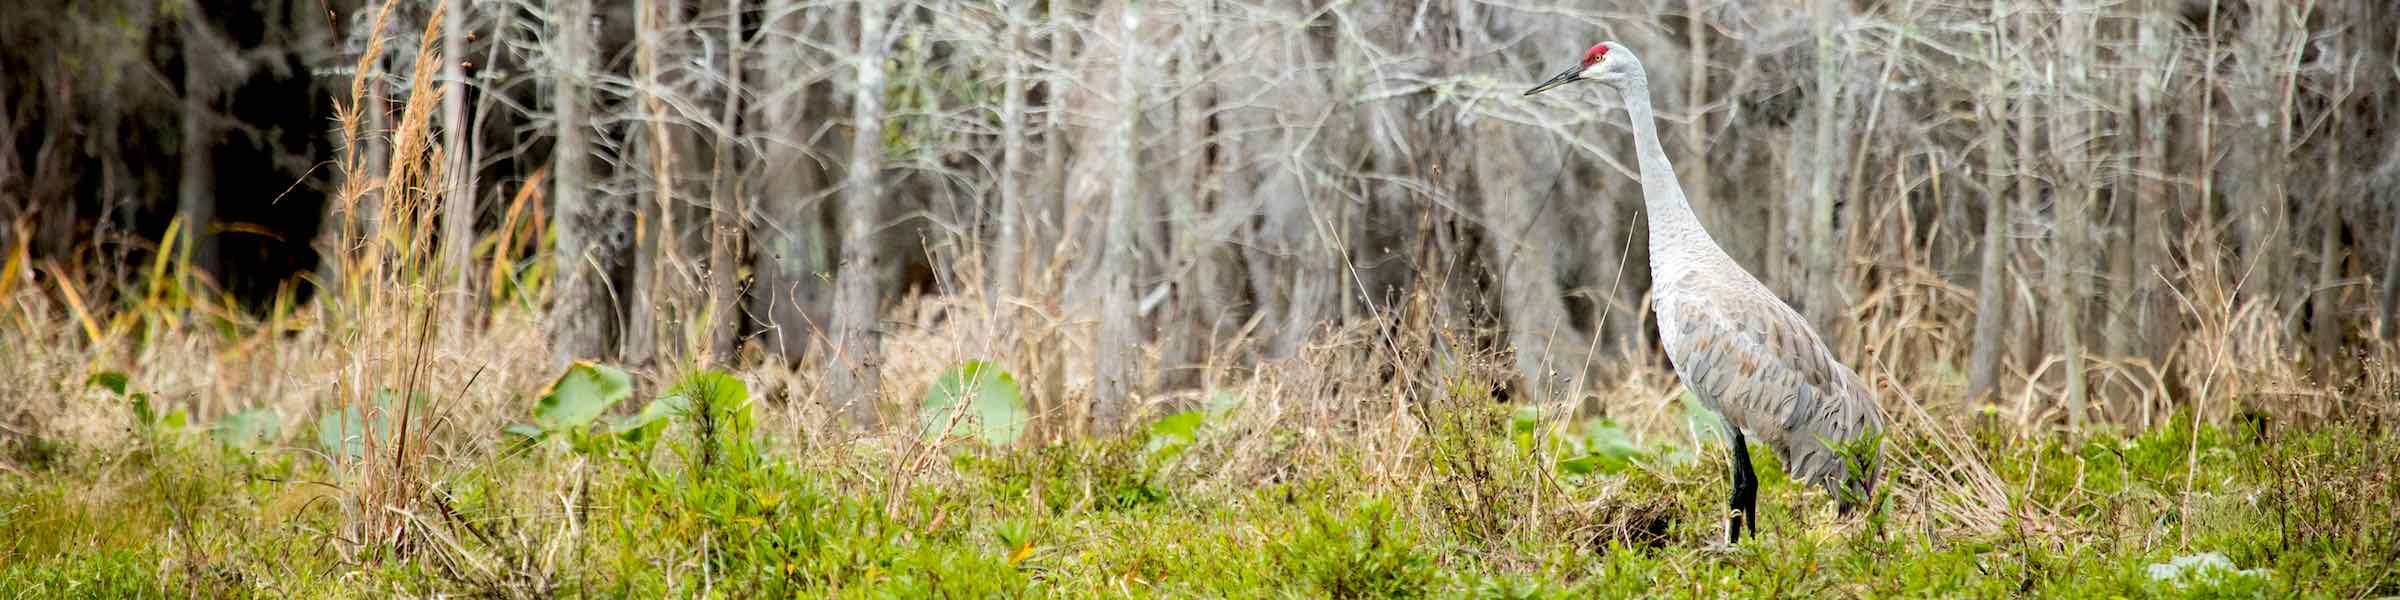 Sandhill crane in the Okefenokee Swamp, Georgia.